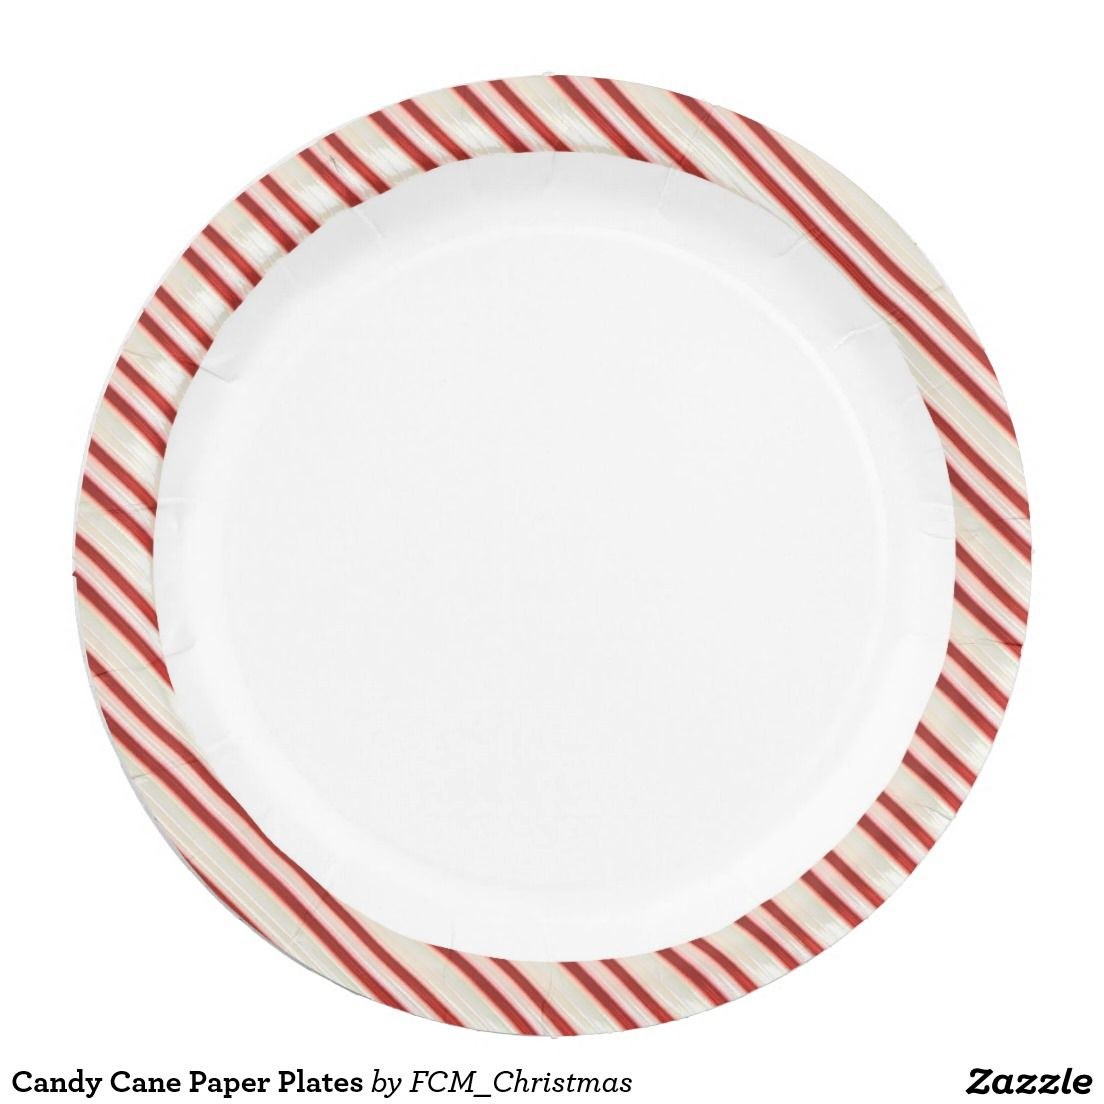 Candy Cane Paper Plates  sc 1 st  Pinterest & Candy Cane Paper Plates | Candy canes and Christmas paper plates